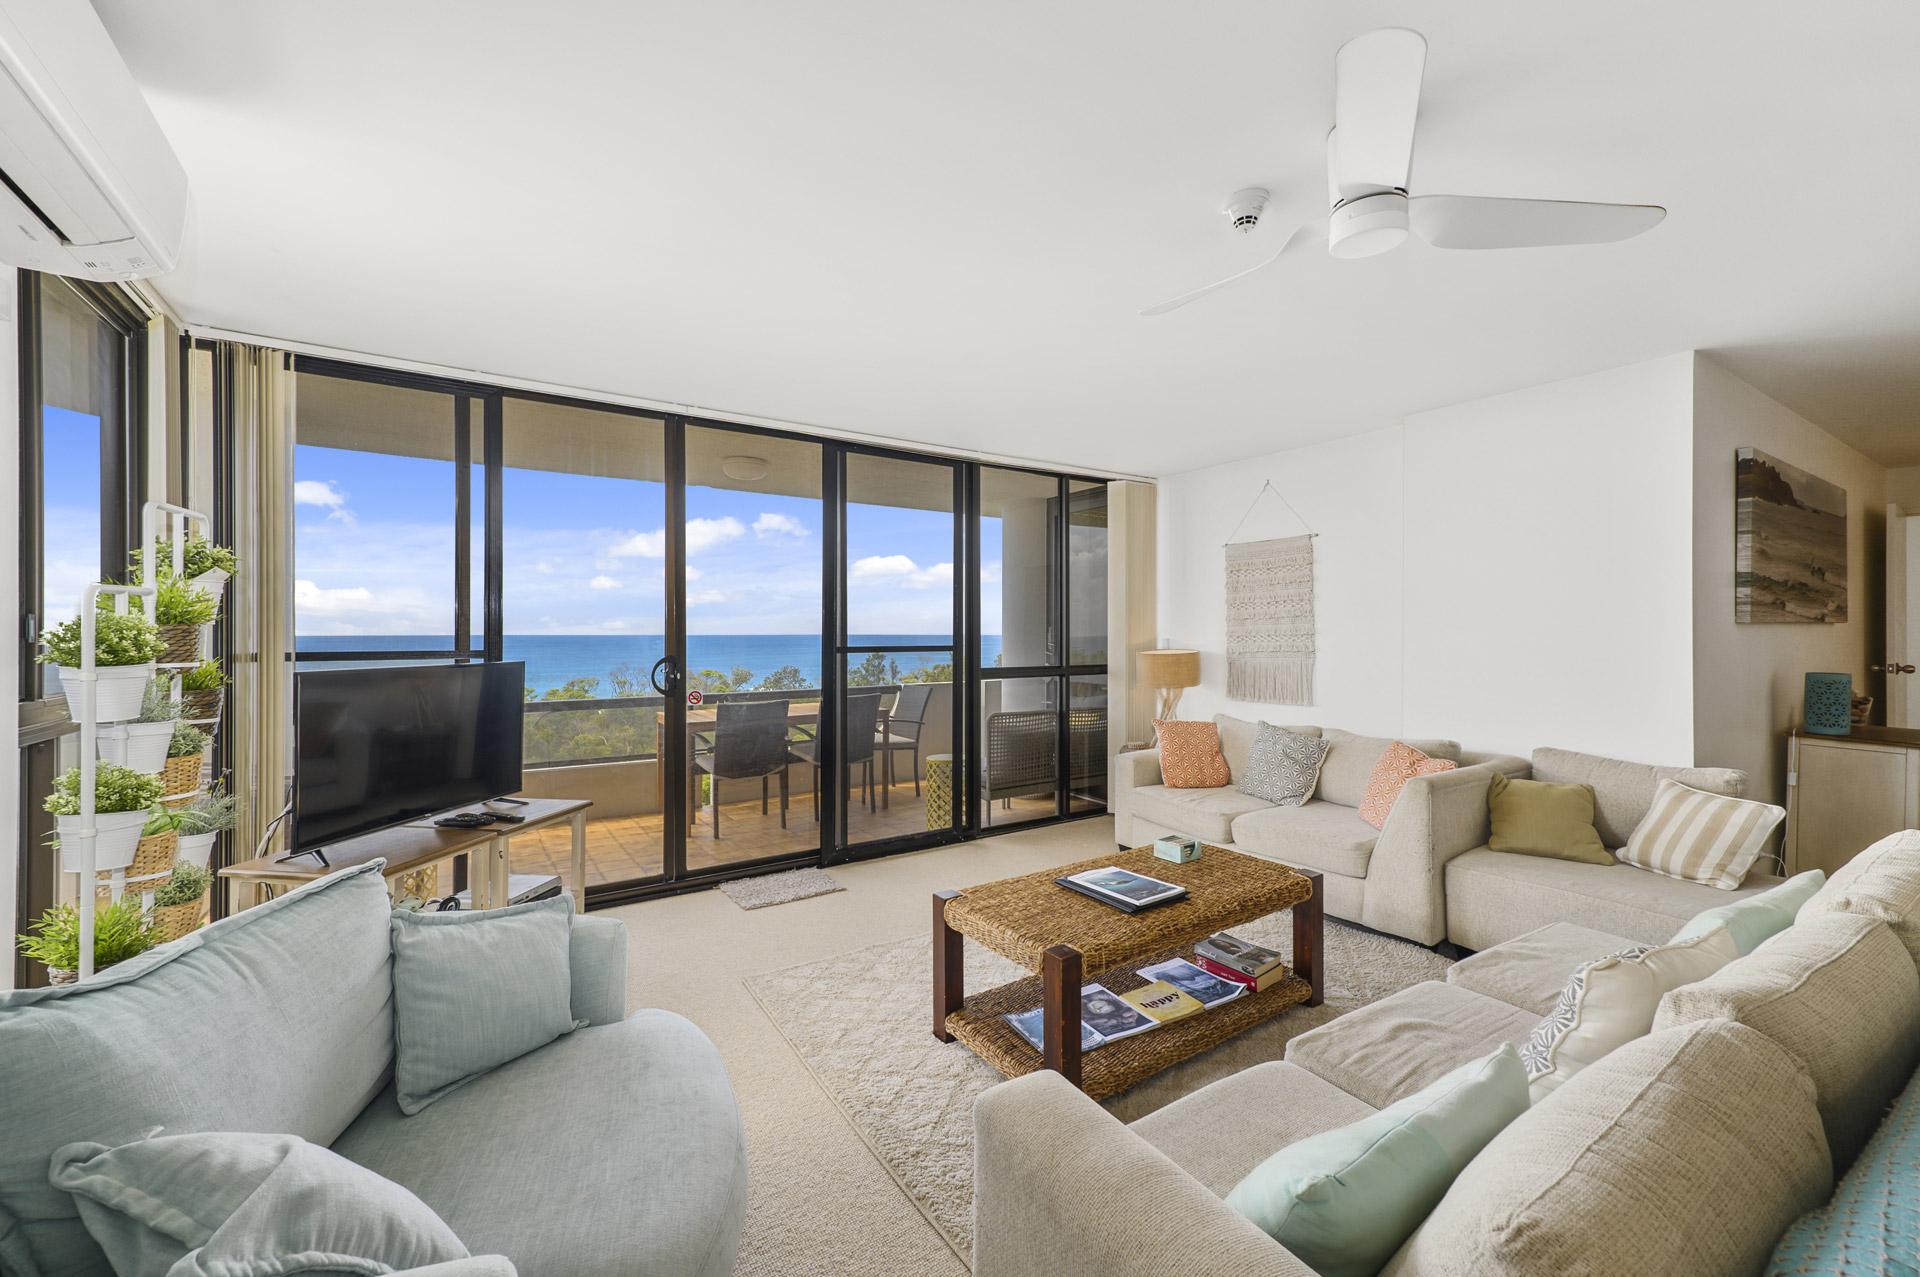 2-bedroom-ocean-view-apartments-802-11